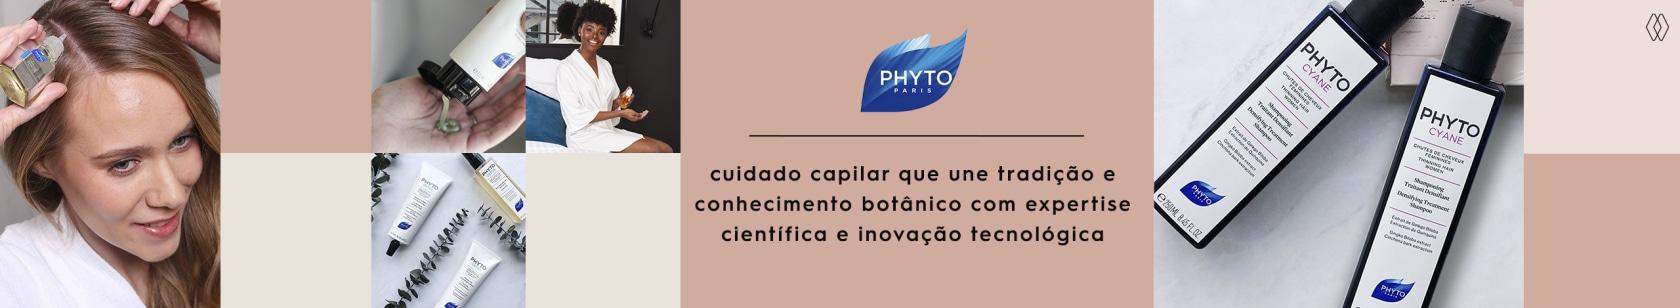 PHYTO | AMARO